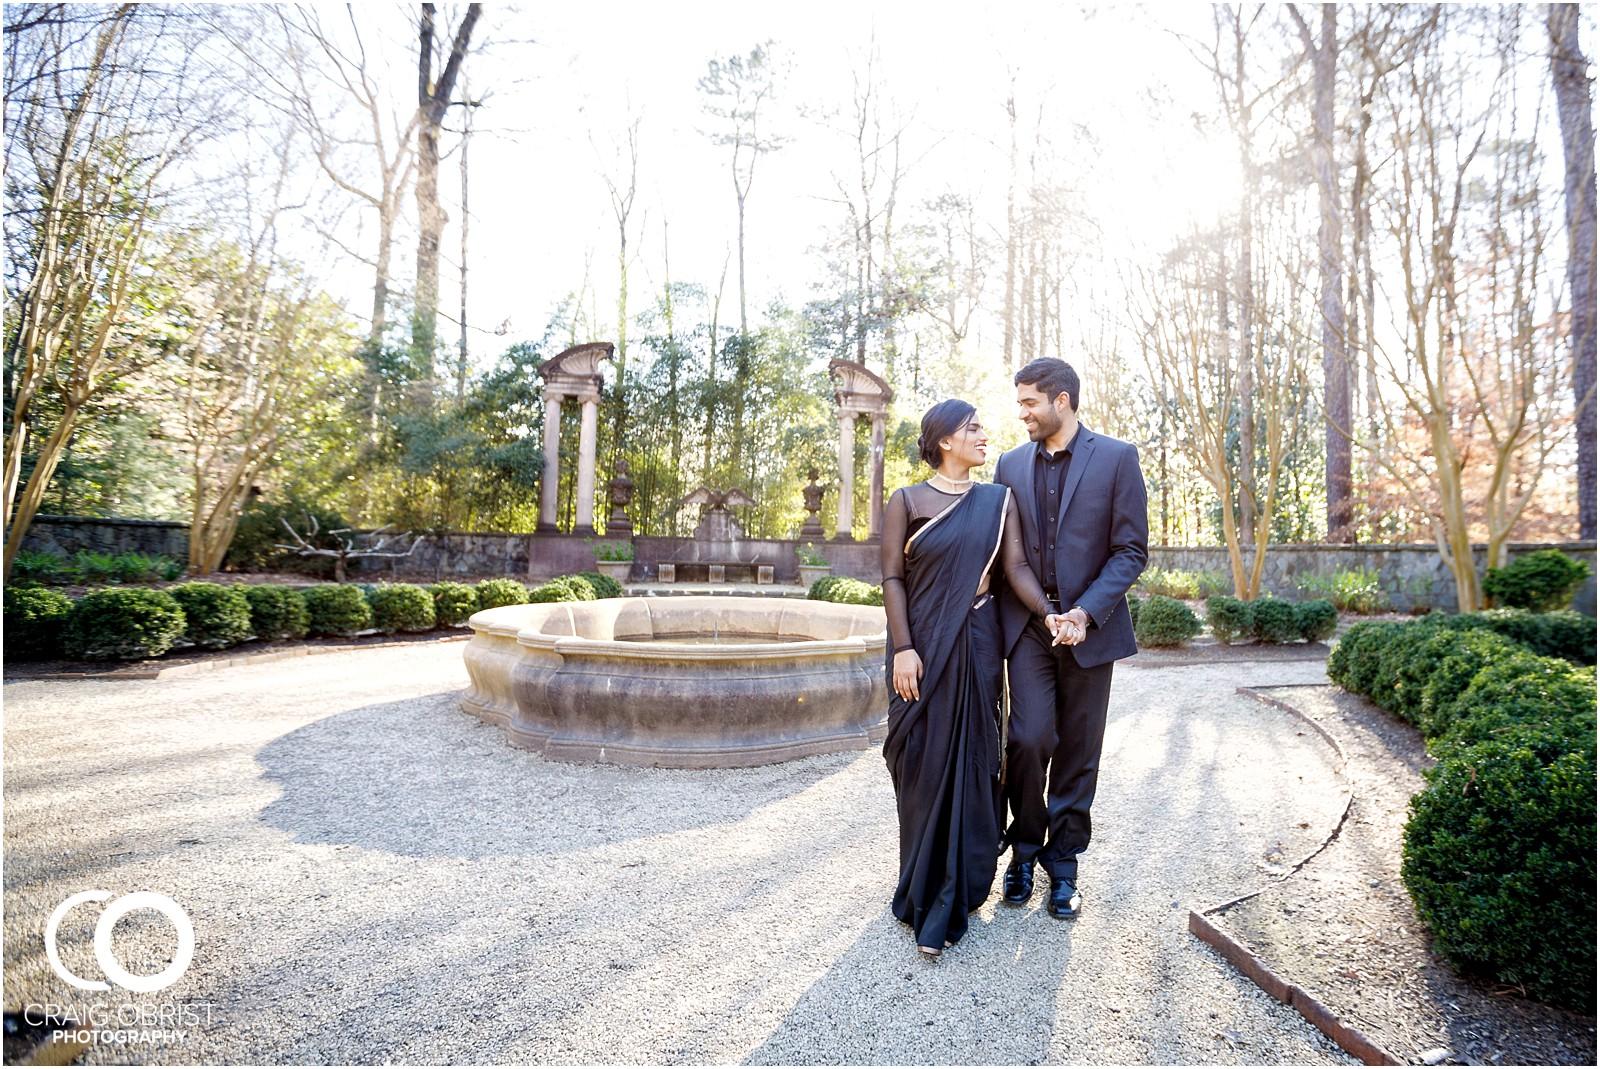 Swan House Atlanta History Center Engagement Portraits_0018.jpg